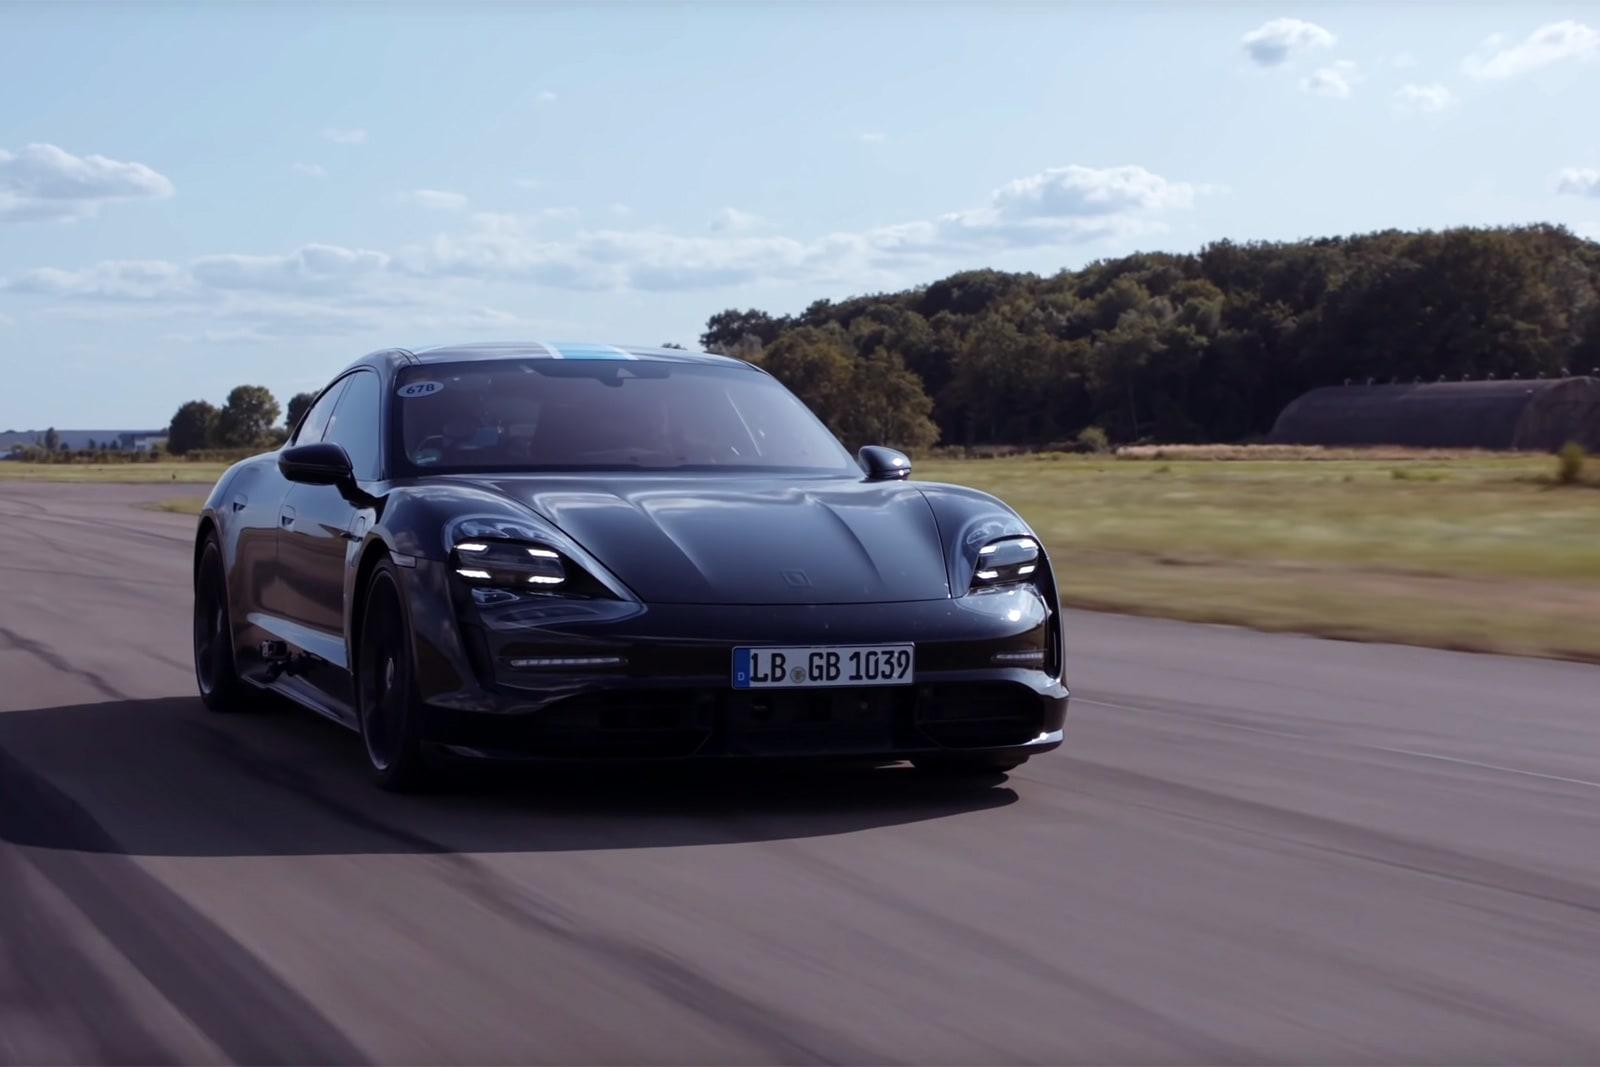 Porsche Taycan test drive shows the EV's repeatable launch control